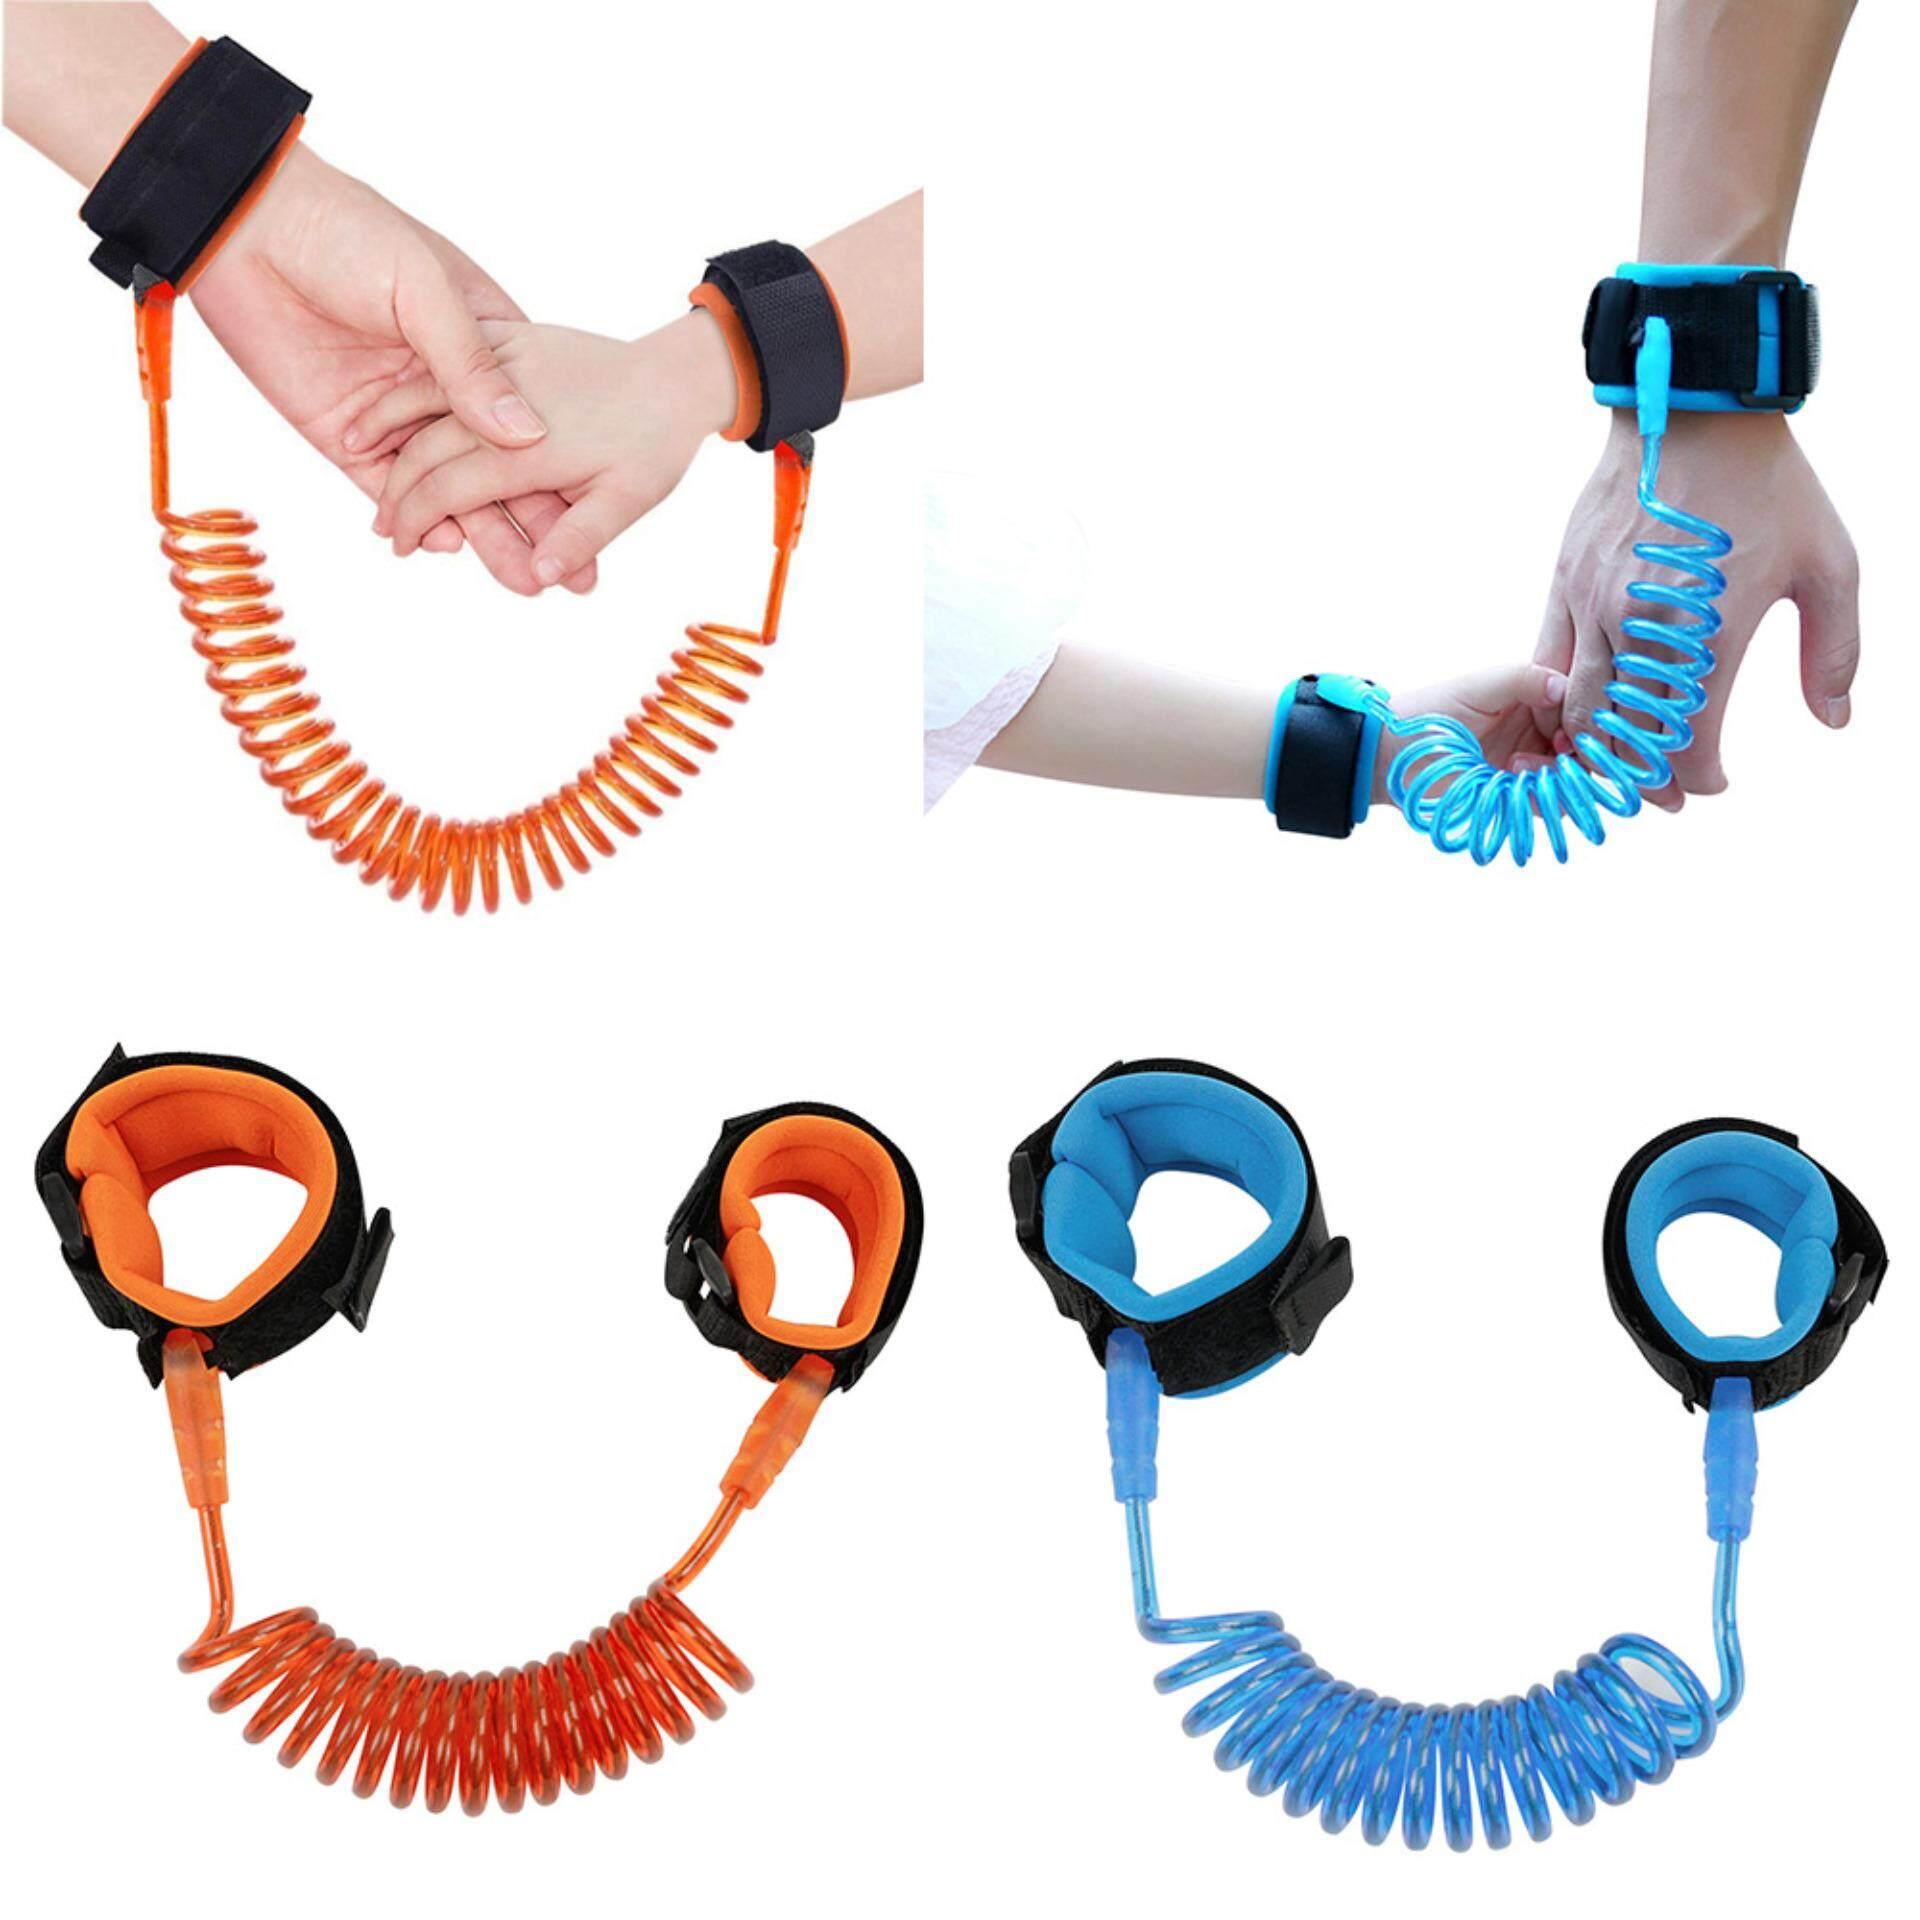 Fengsheng 2PCS 2.5M Loop Fastener Wrist Link Rope Band Leash Belt Baby Child Anti Lost